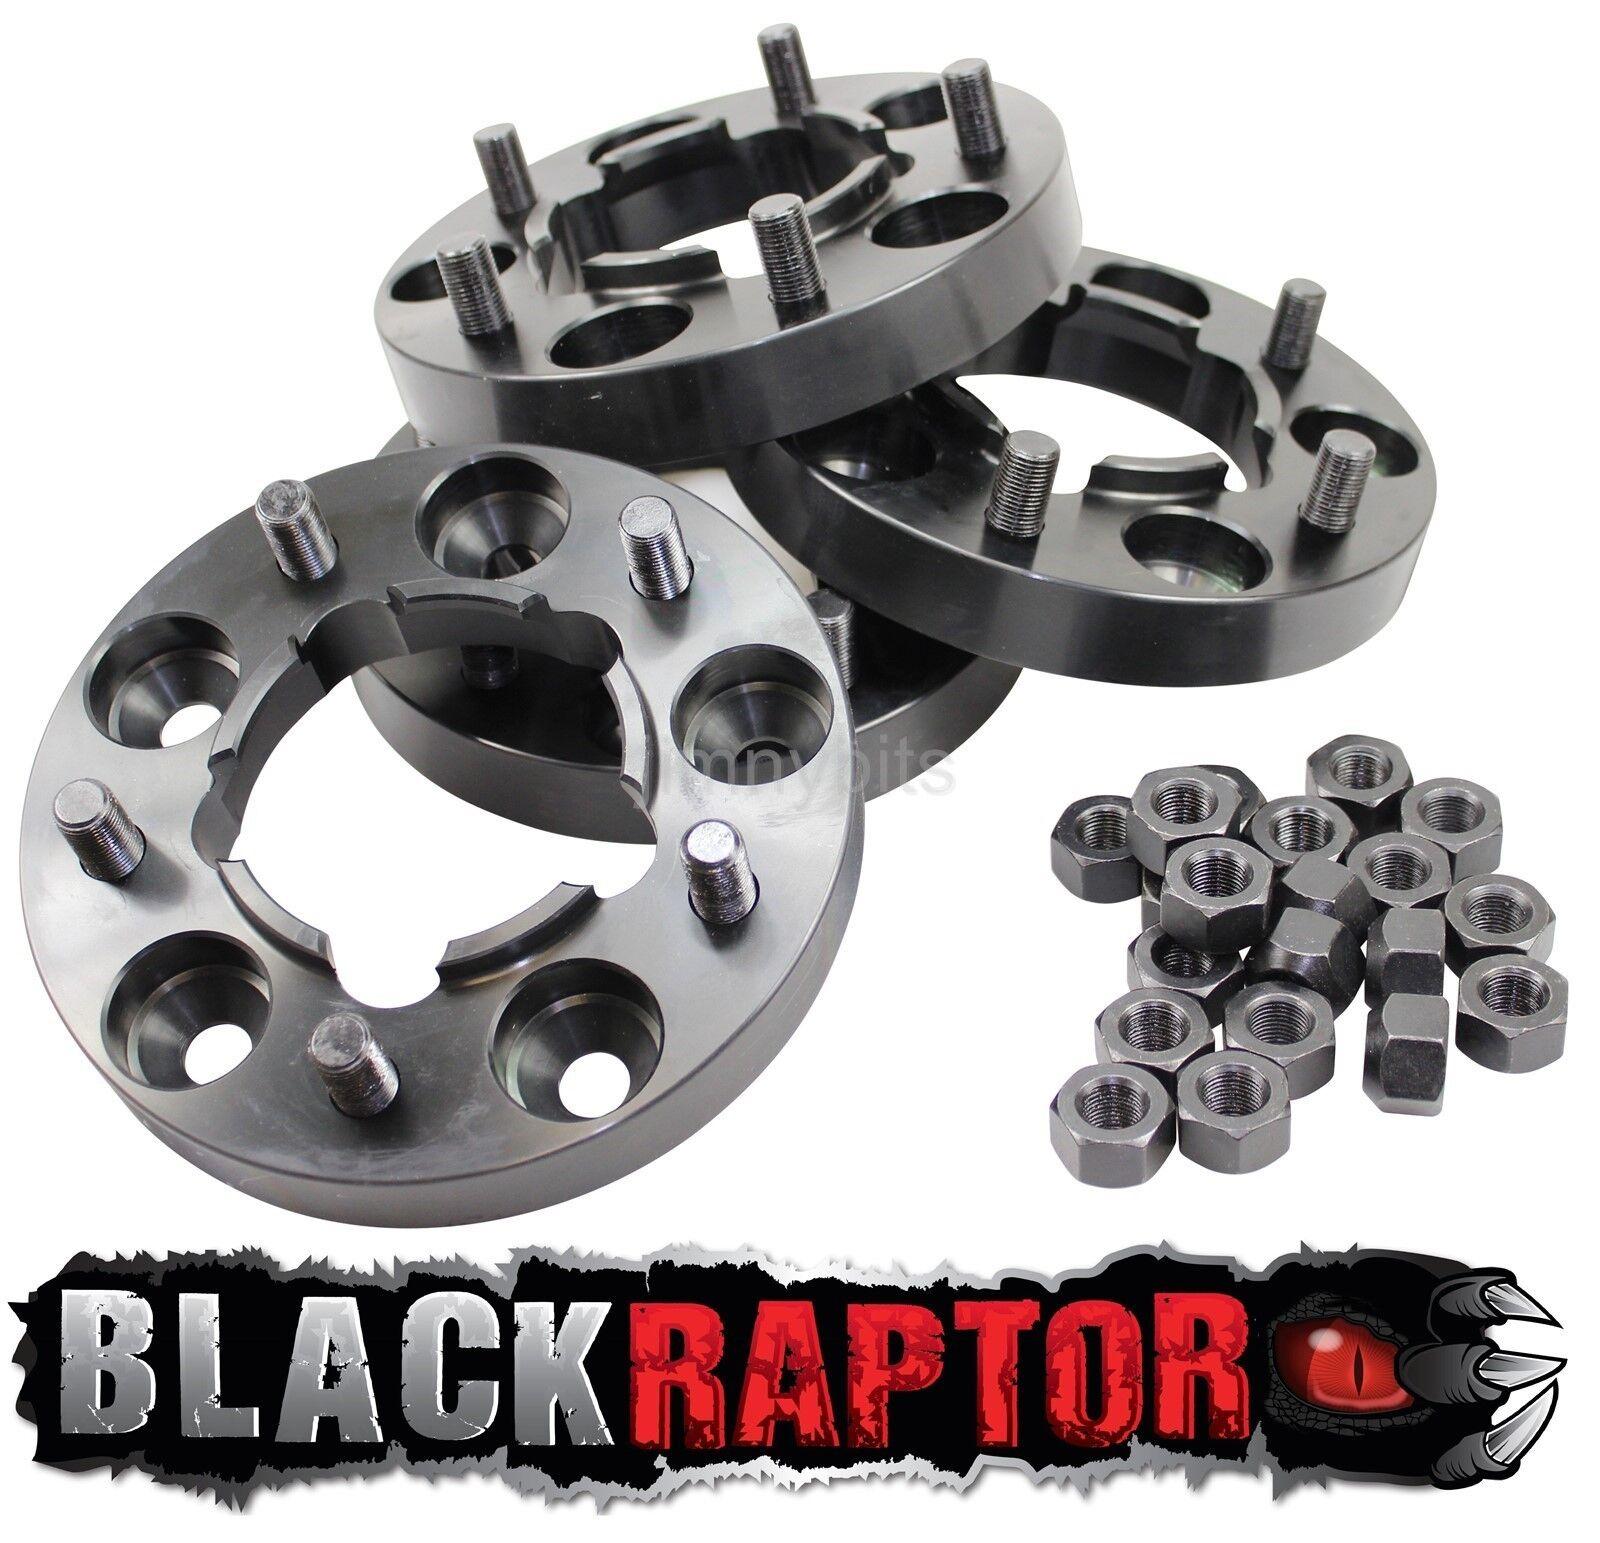 Negro Raptor Hubcentric 30 mm Aluminio Land Rover Defender Rueda Espaciadores 90 110